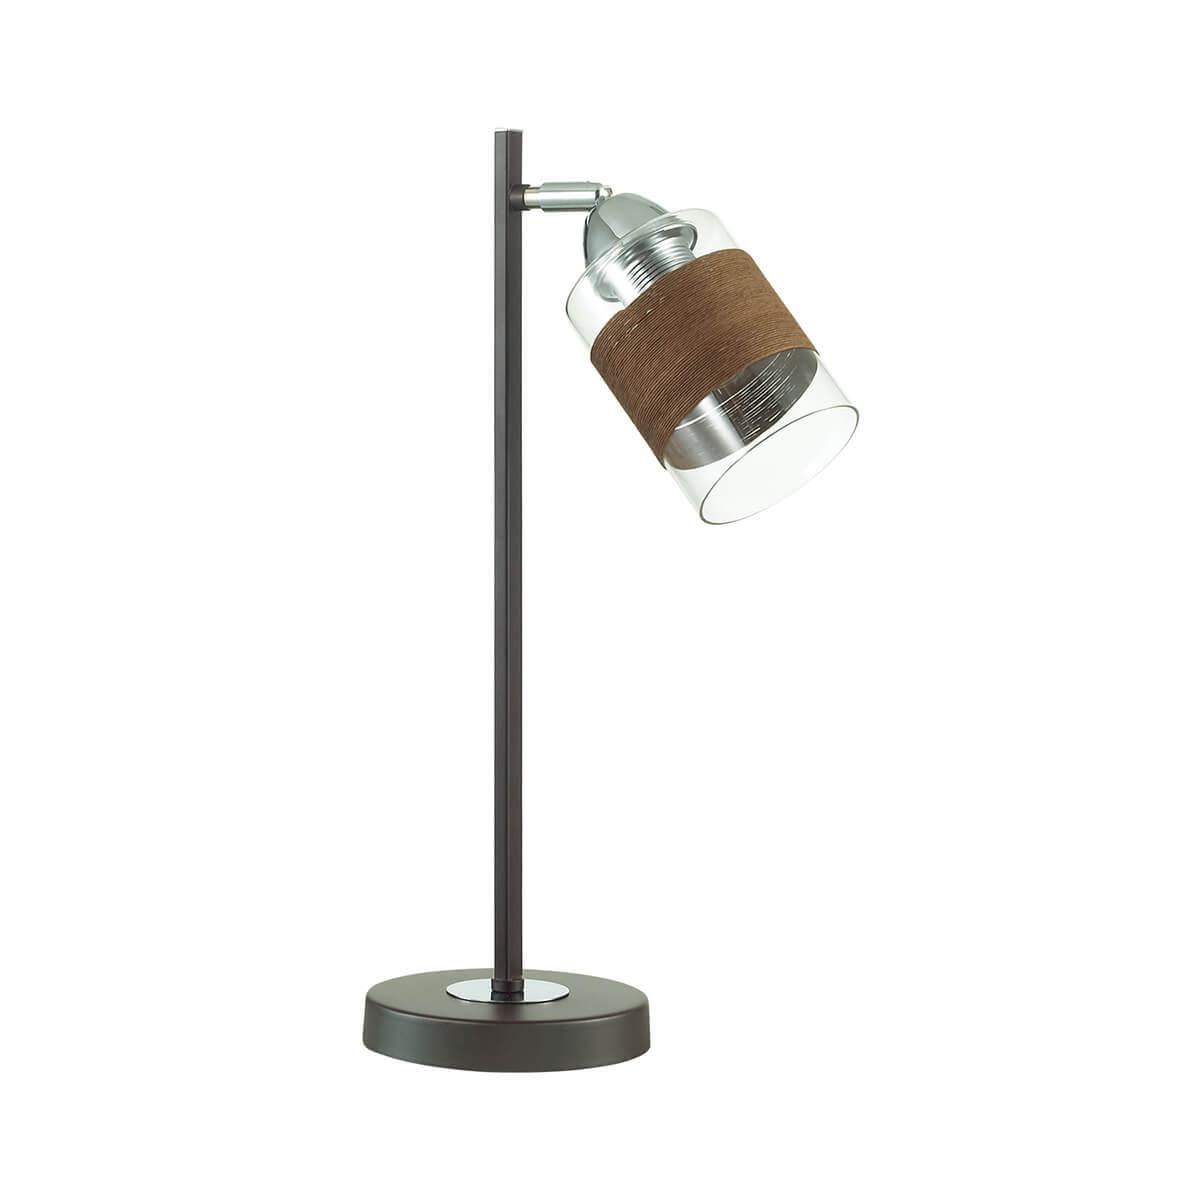 цена Настольная лампа Lumion 3030/1T Comfi онлайн в 2017 году